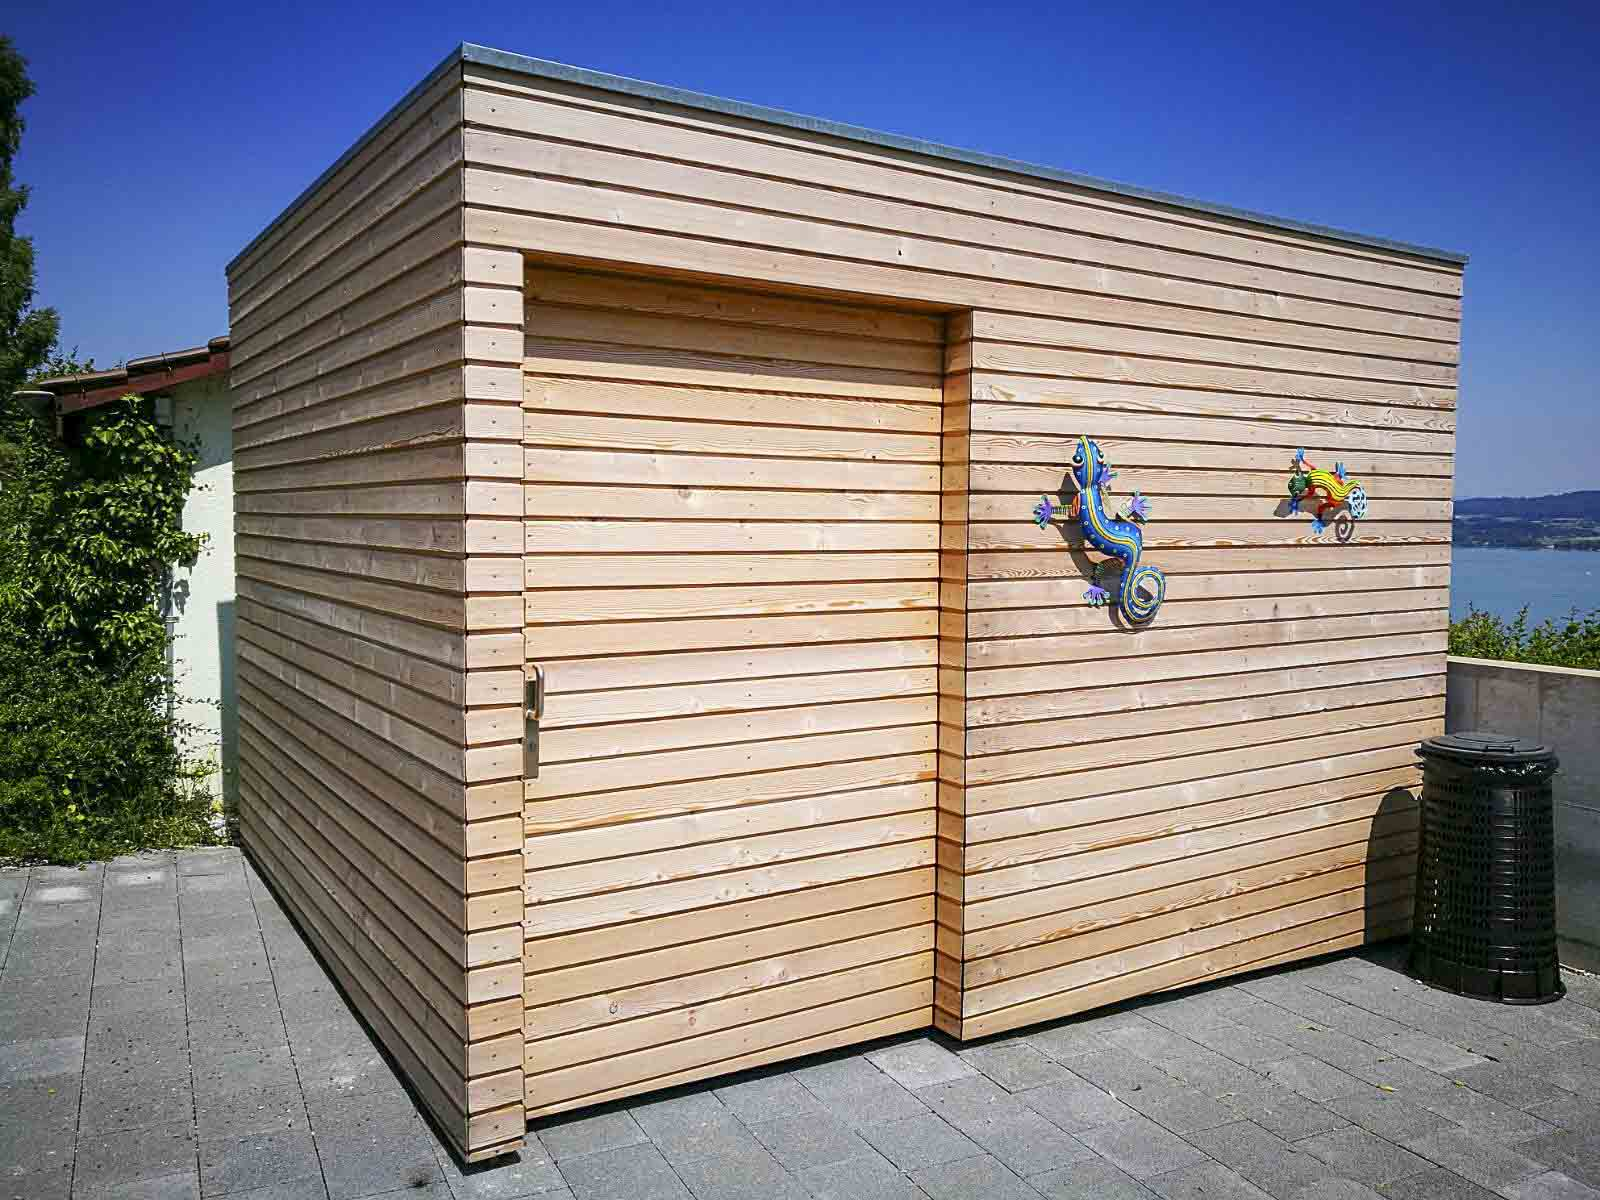 Wooddesign_Terrassengestaltung_Veounterstand_Carport_Lärchenholz vergraut_Holzverschalung_Schiebetüre-Flachdach (2)